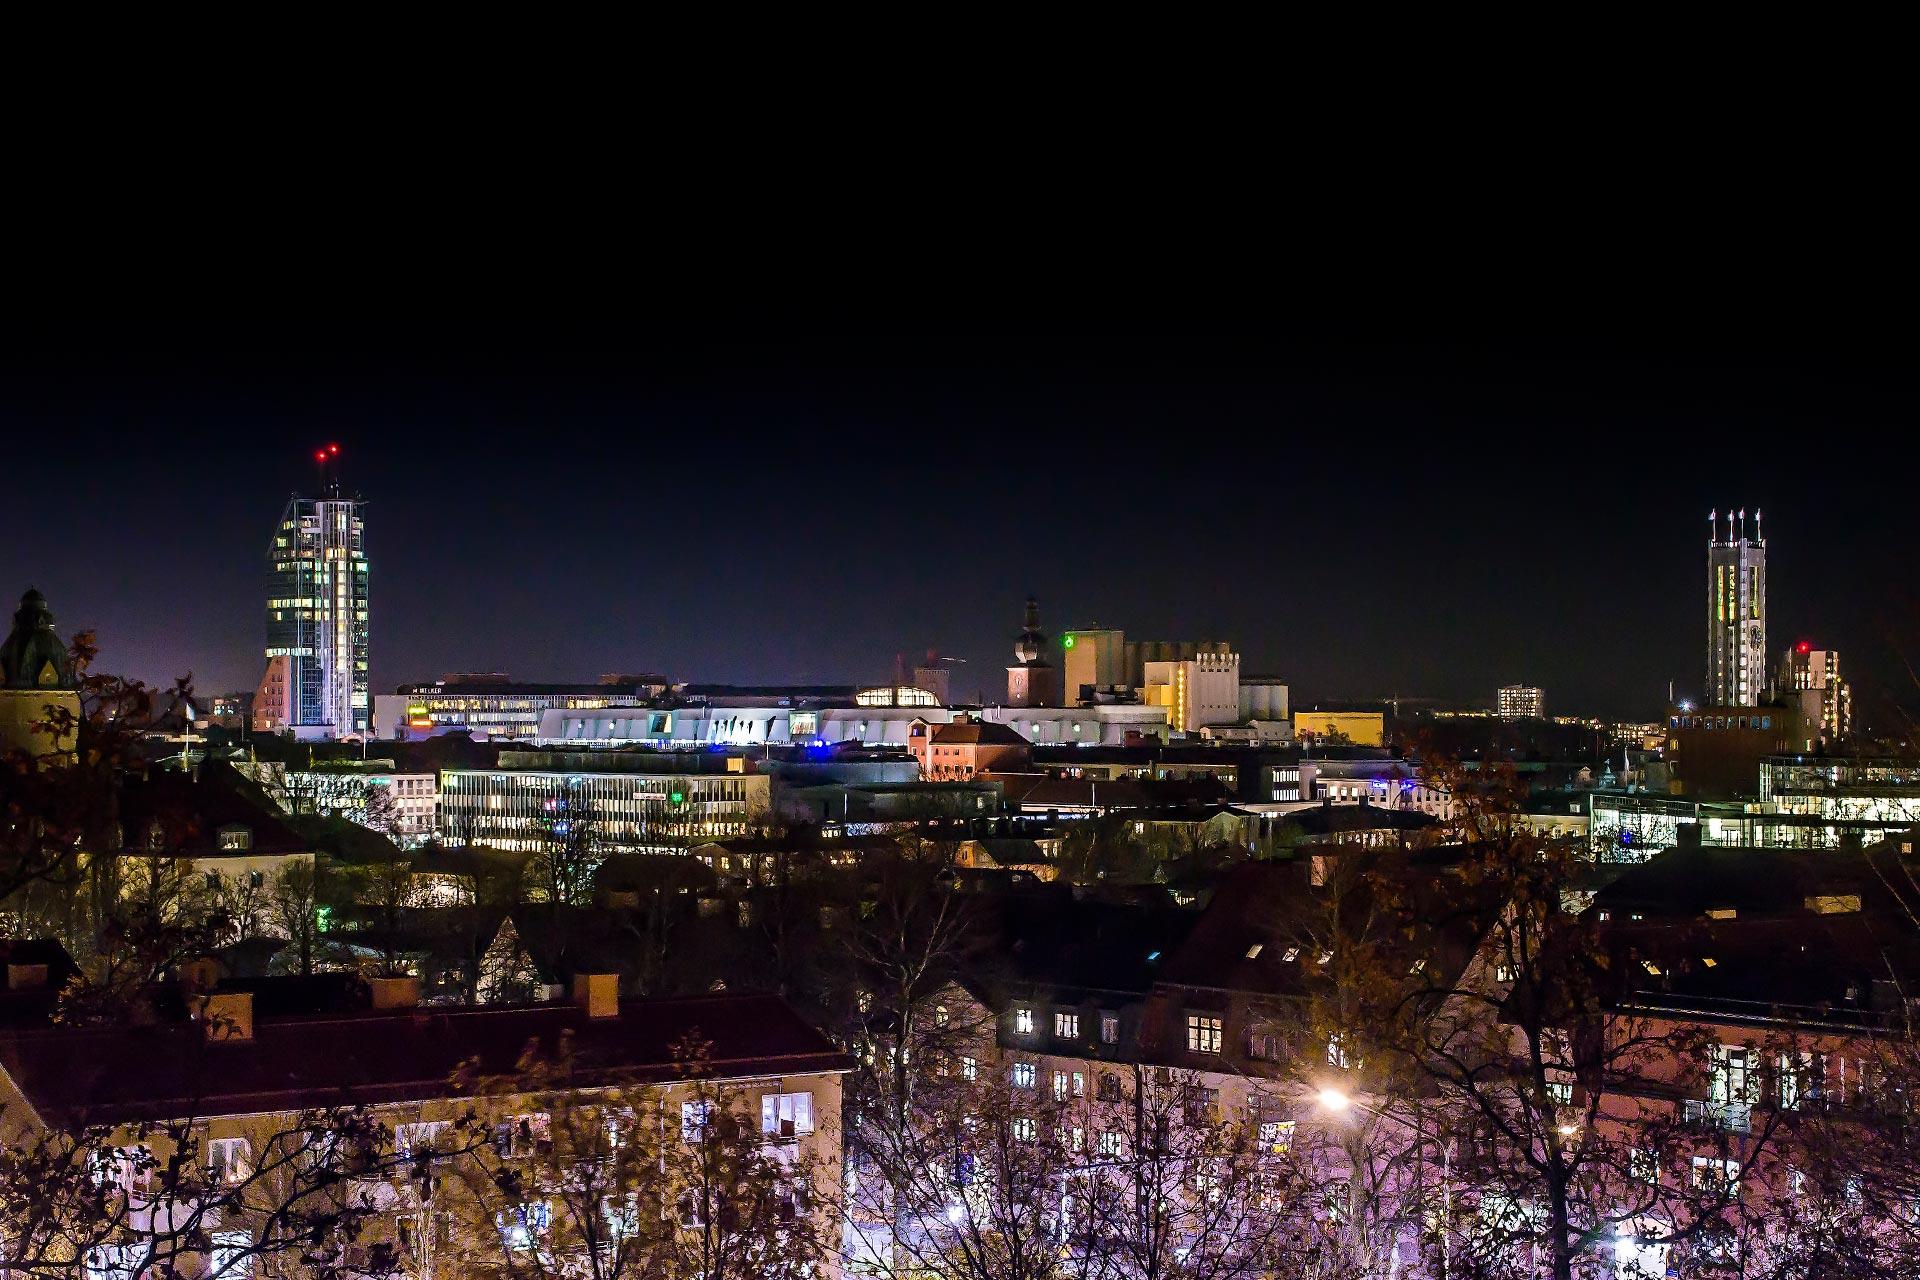 Västerås i kvällsbelysning. Fotograf: Mostphotos